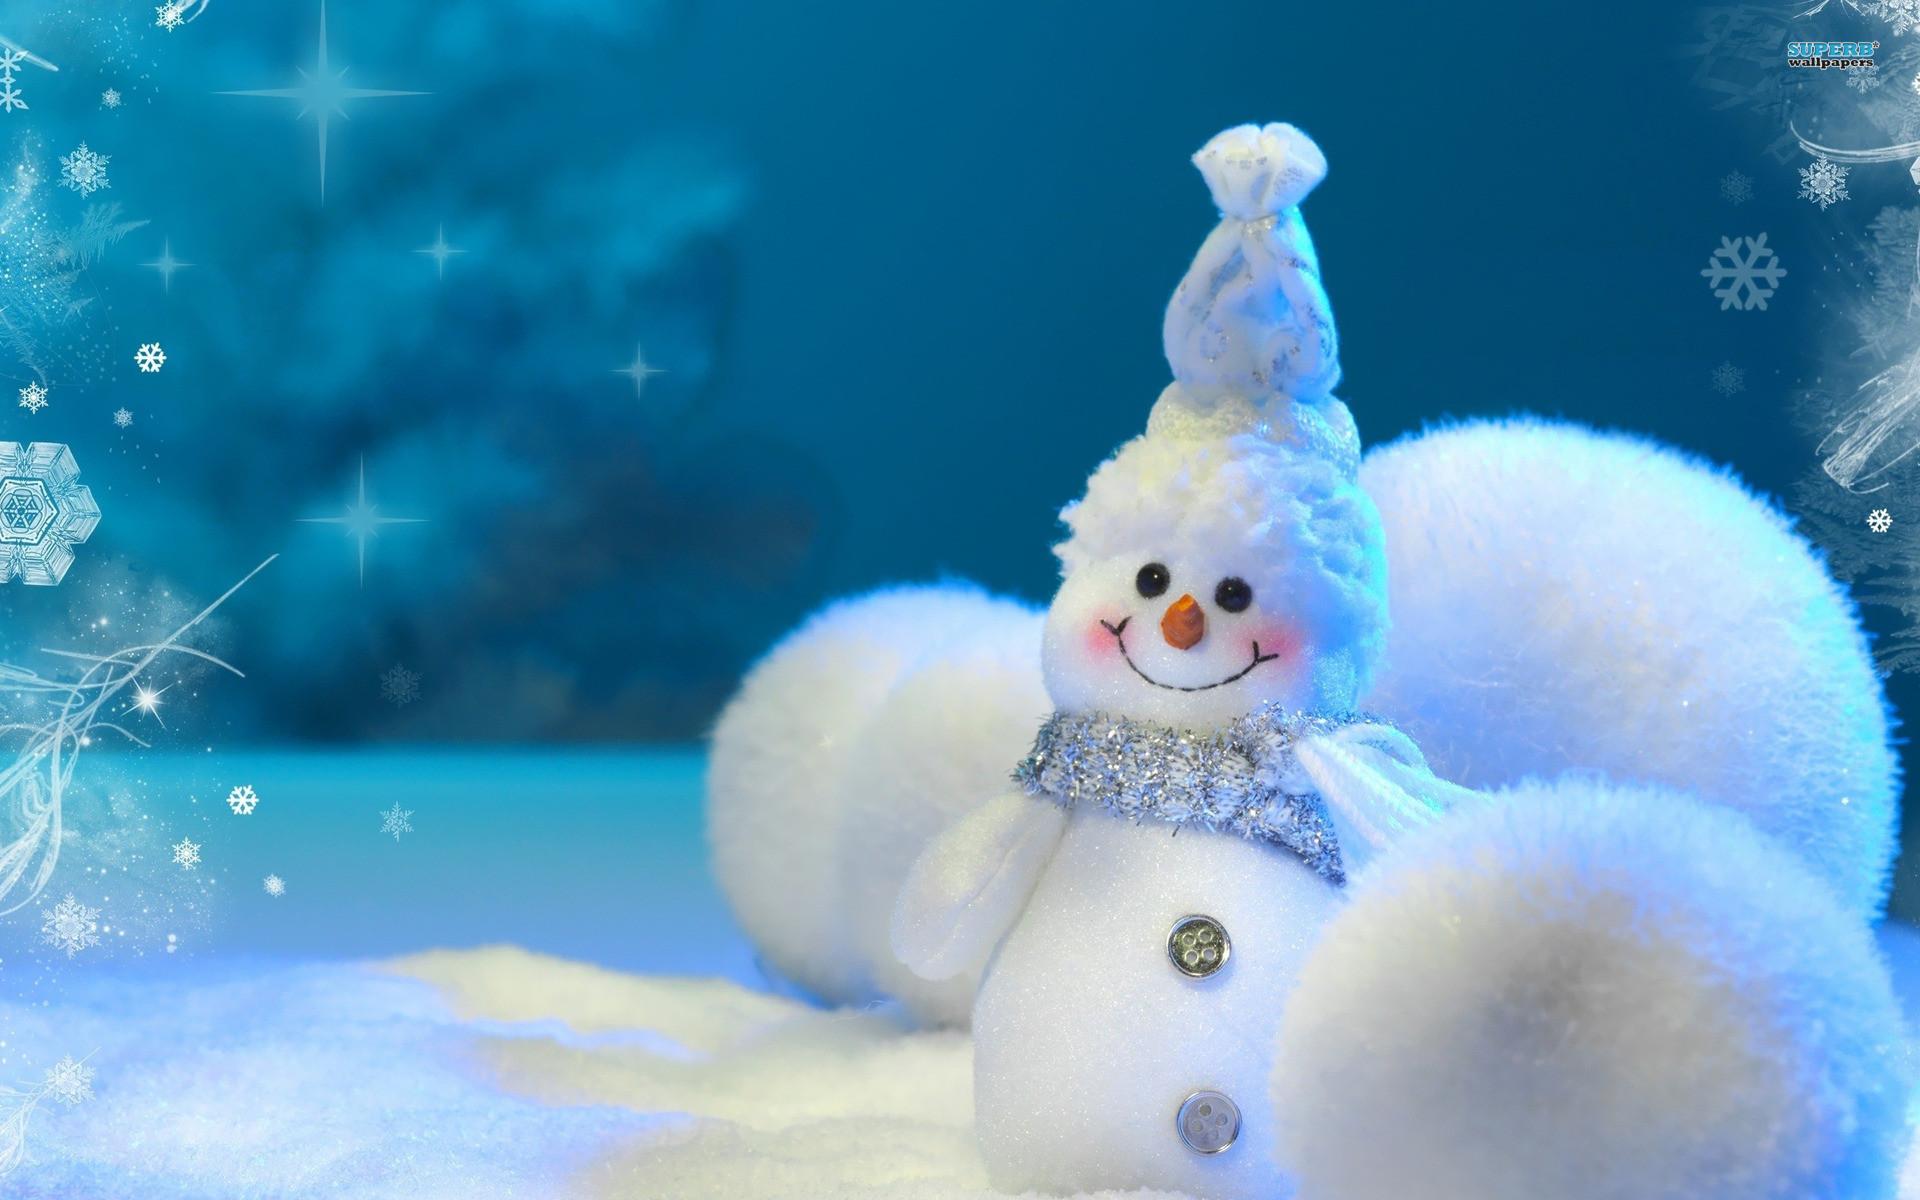 Explore and share Winter Snowman Wallpaper on WallpaperSafari